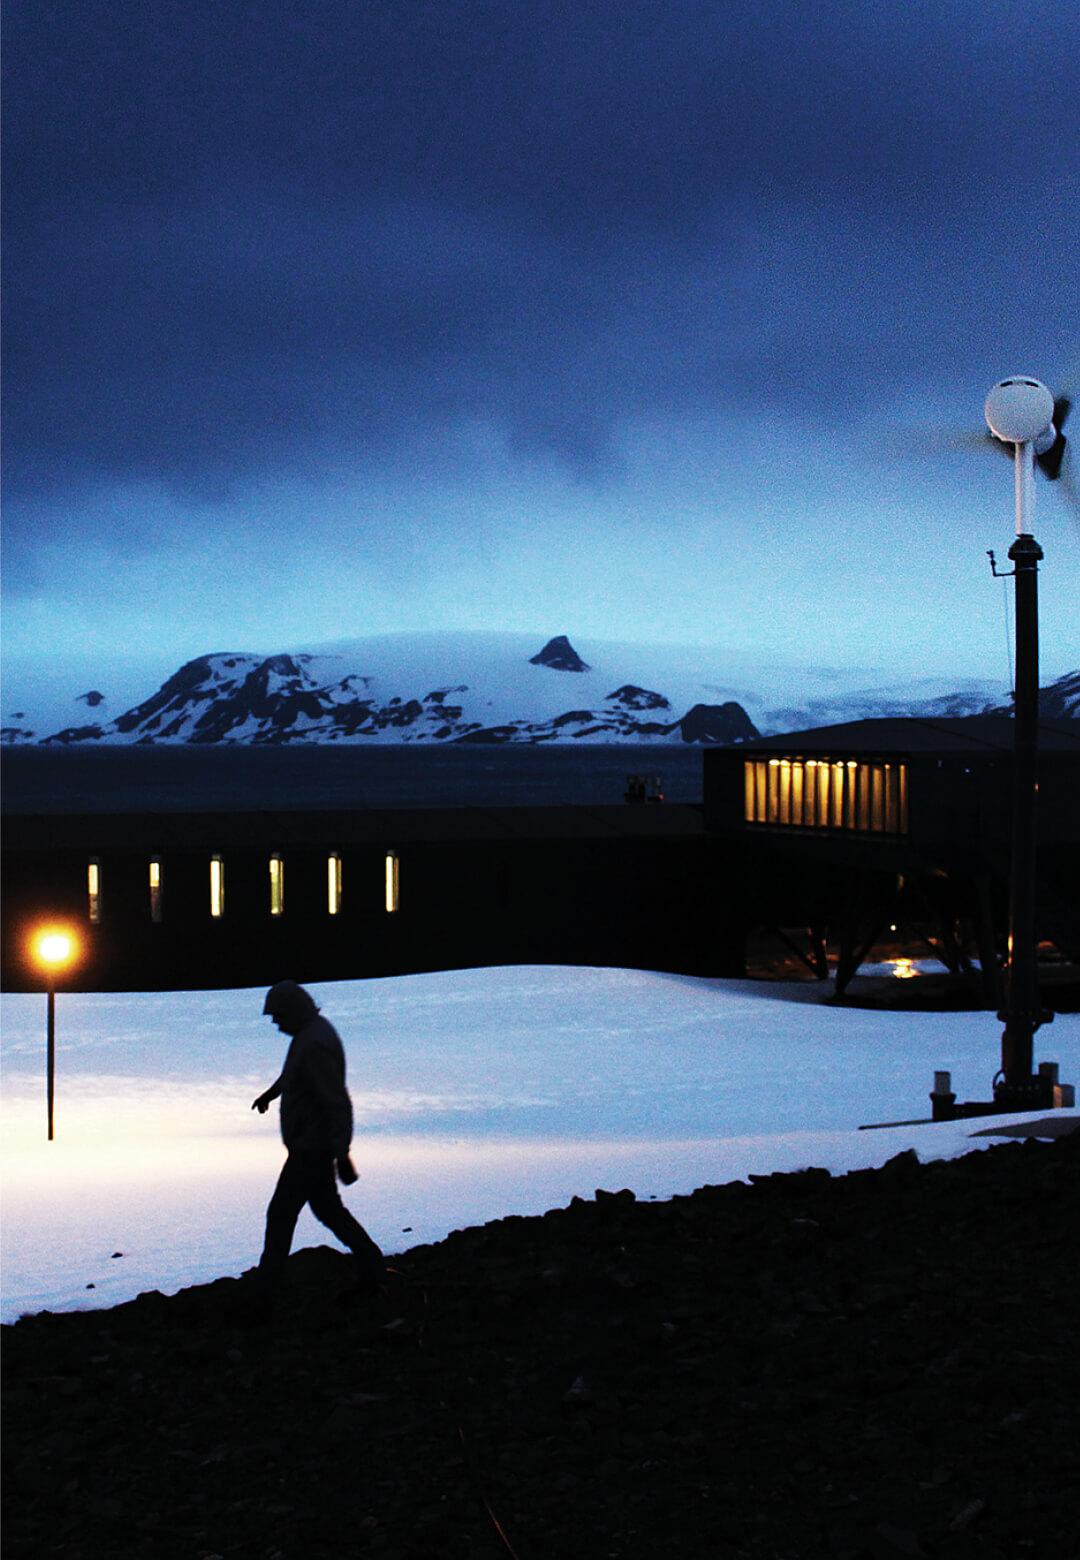 The Comandante Ferraz in Antarctica | Ferraz Station | Estúdio 41 | STIRworld